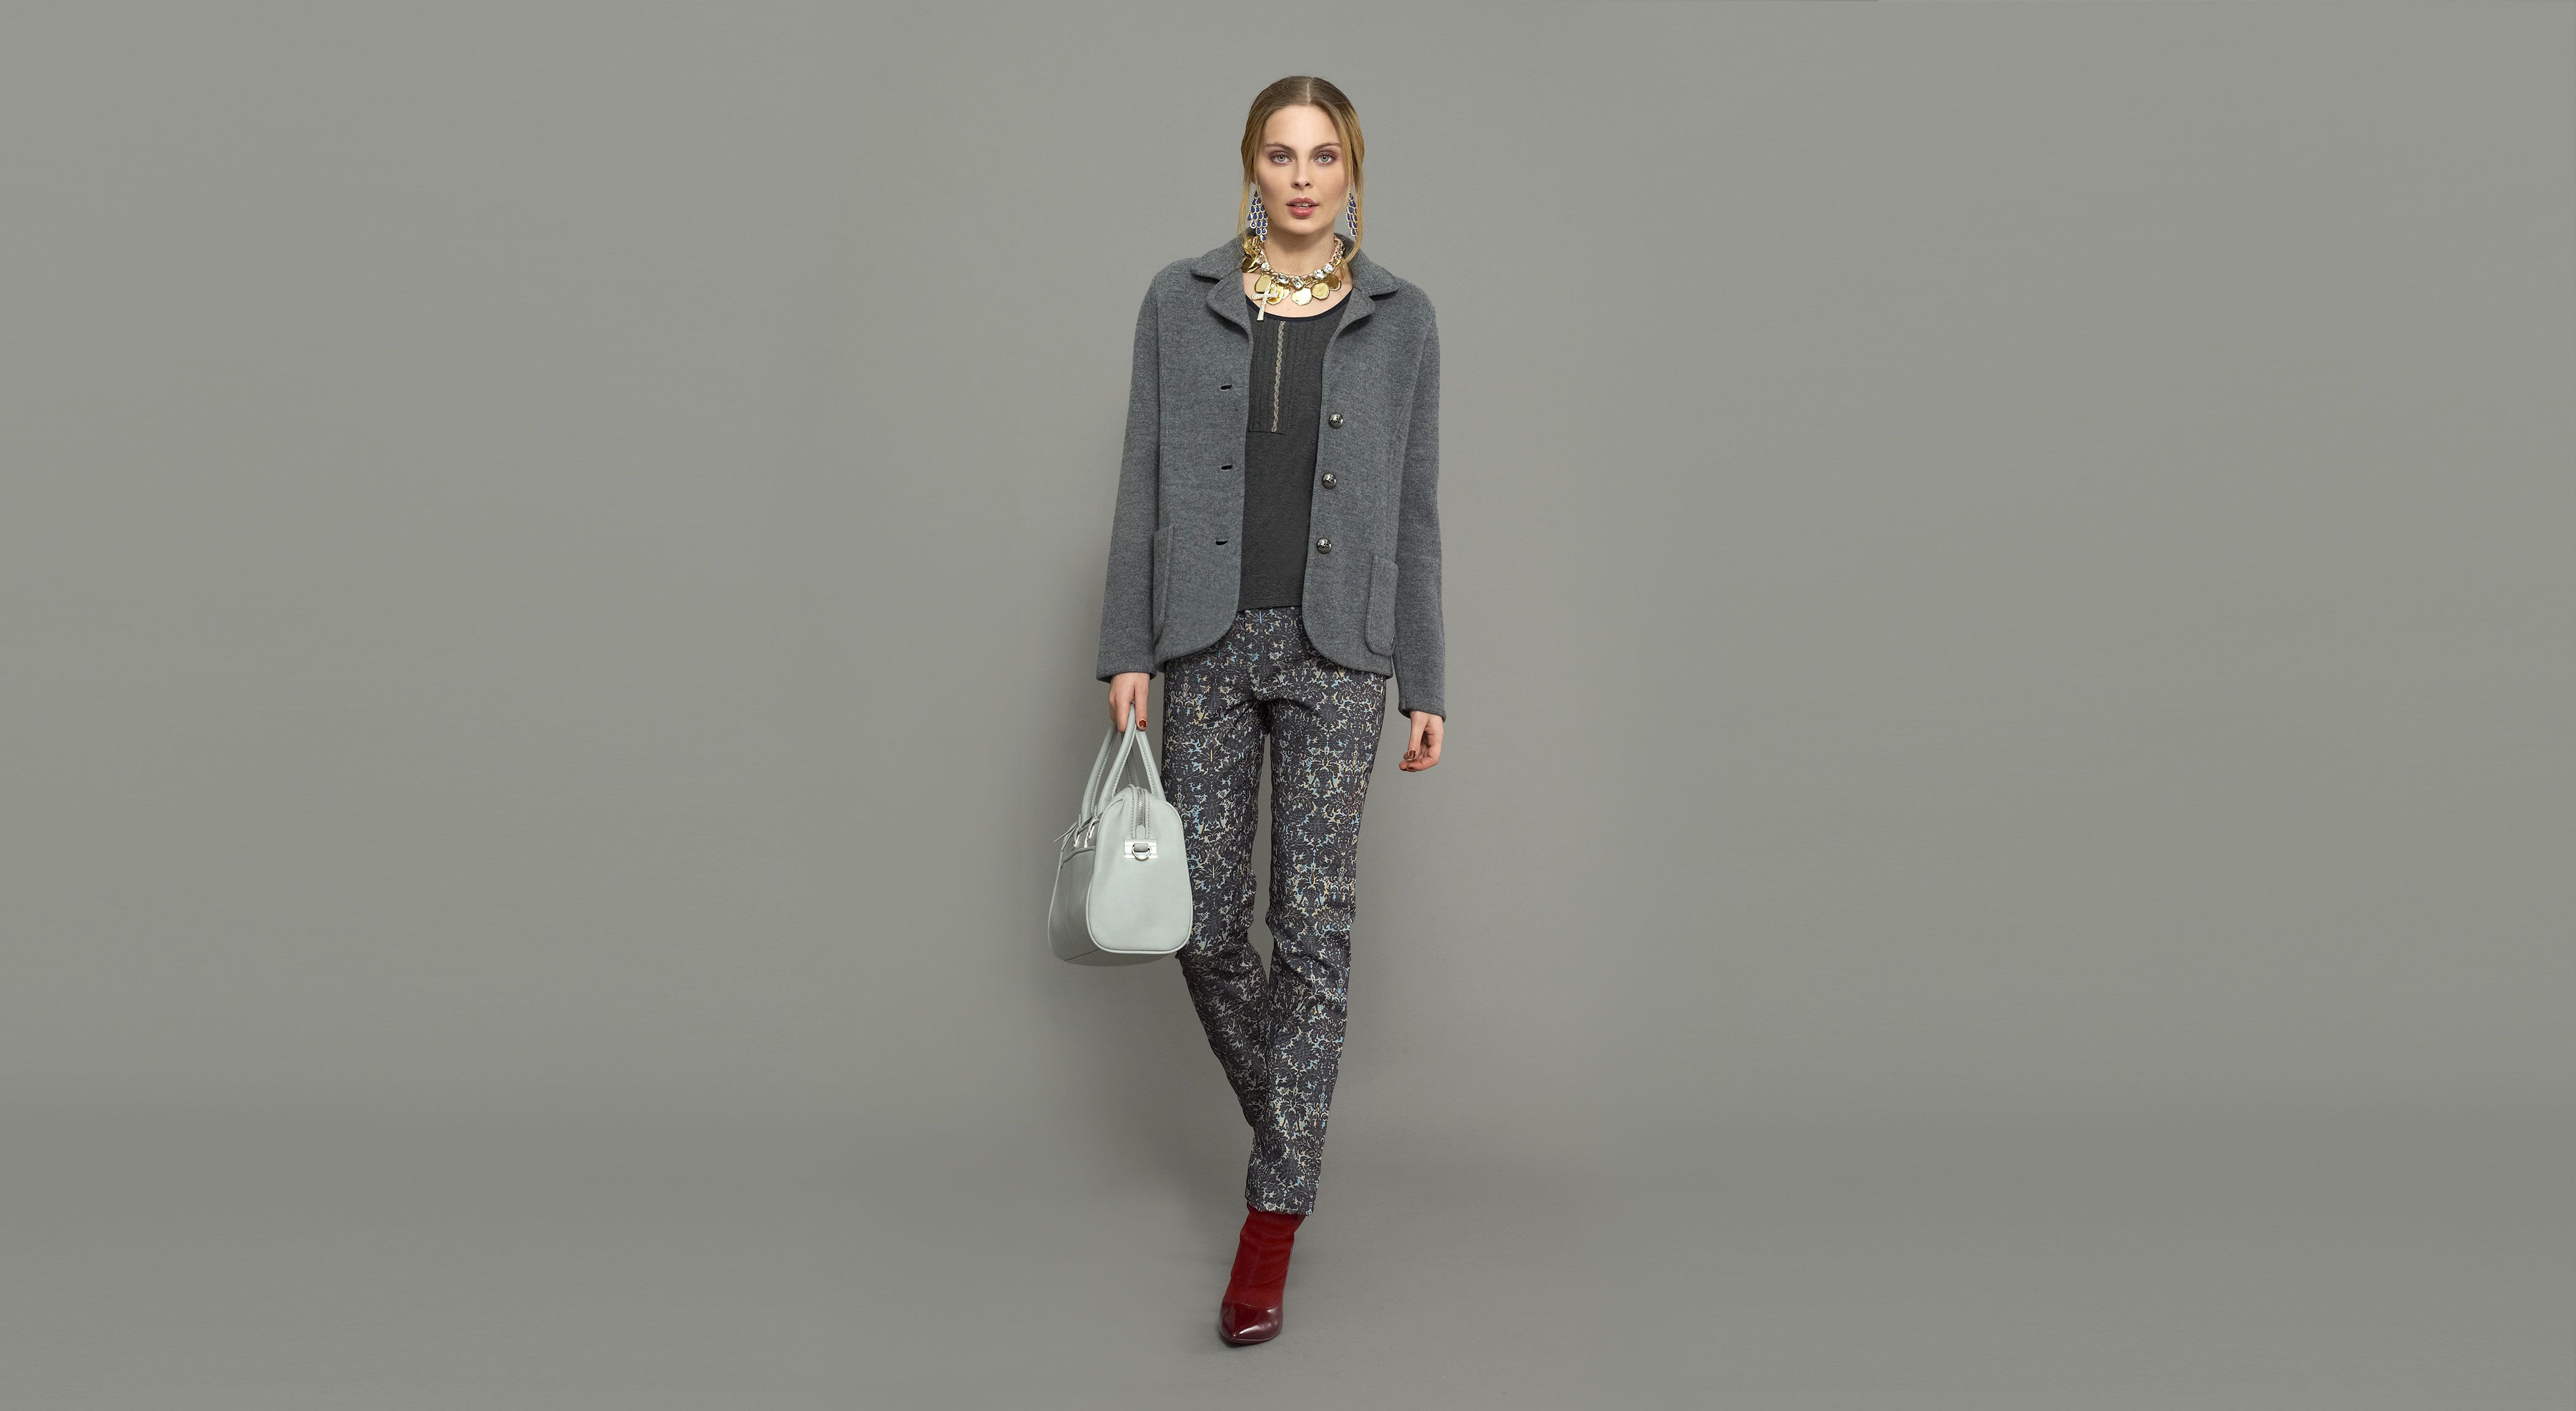 Blazer lana cocida, camiseta y pantalón estampado tapicero. #Naulover #Moda #ModaMujer #Fashion